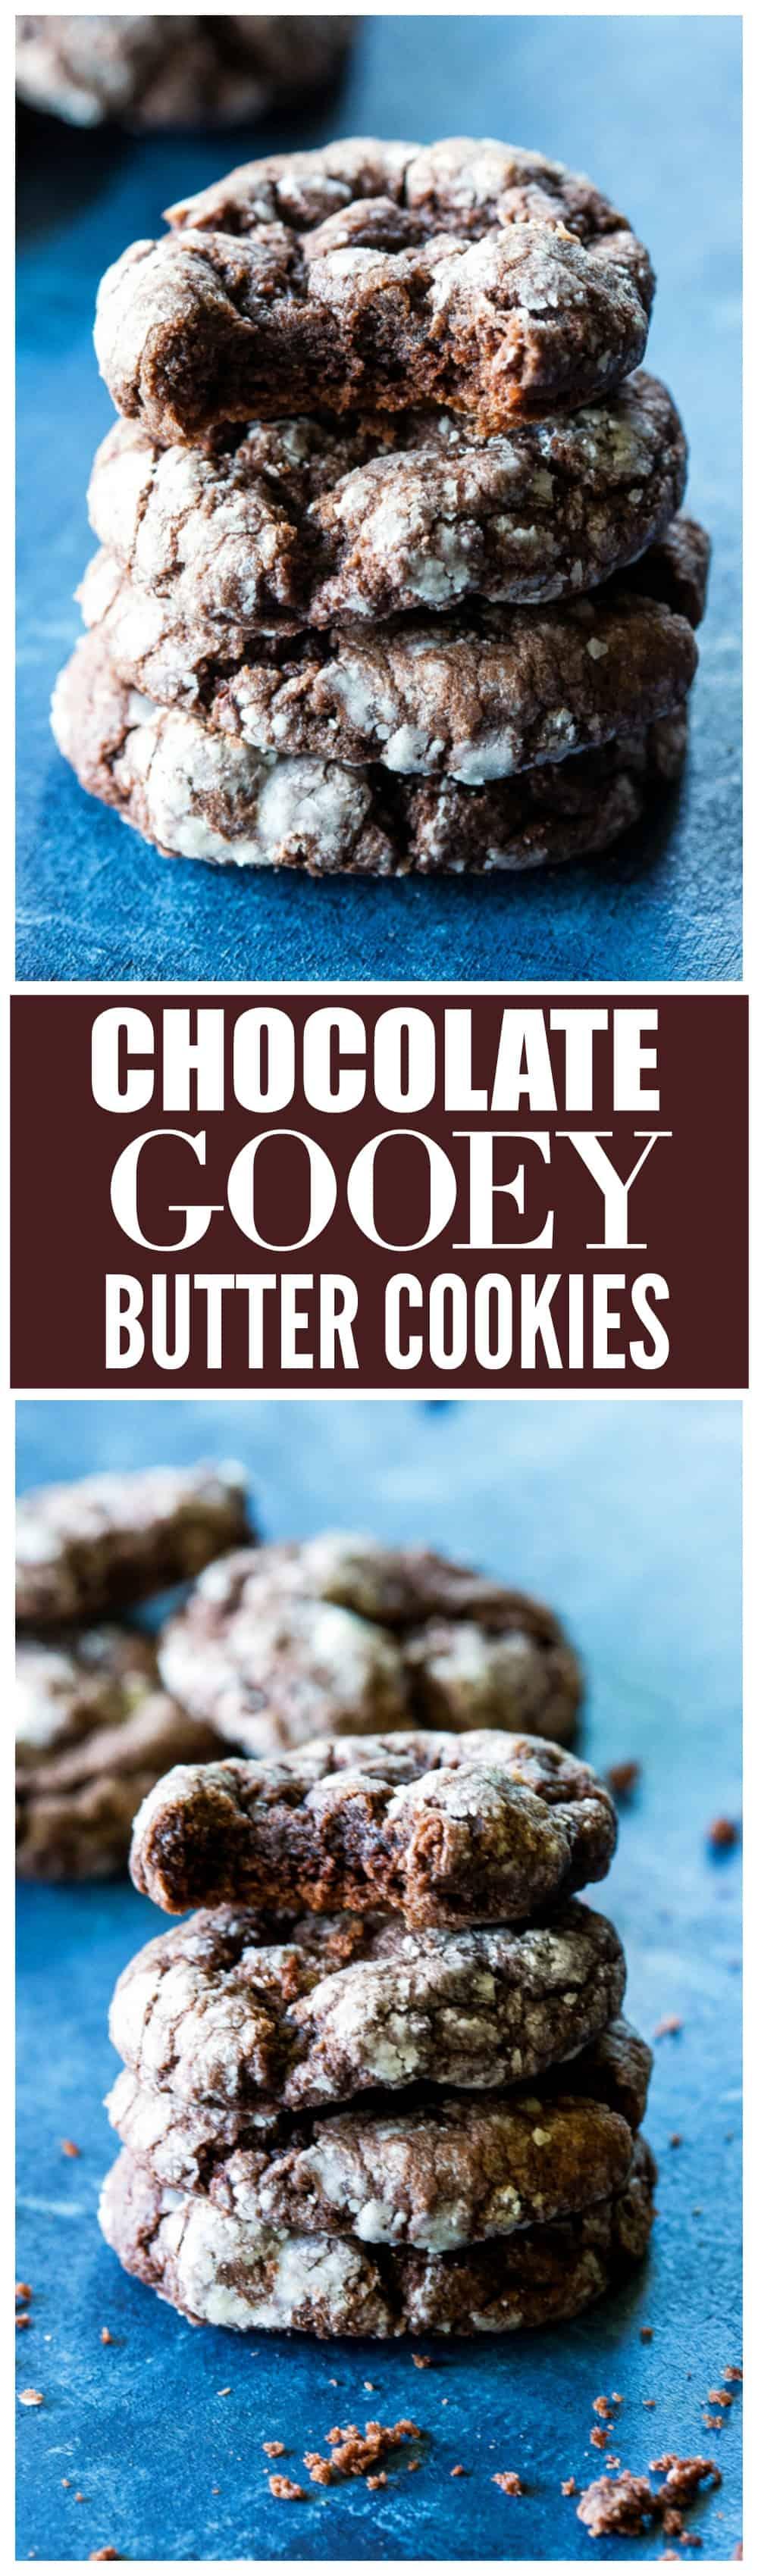 Chocolate Ooey Gooey Butter Cookies - so easy and so good. #chocolate #ooey #gooey #butter #cookies